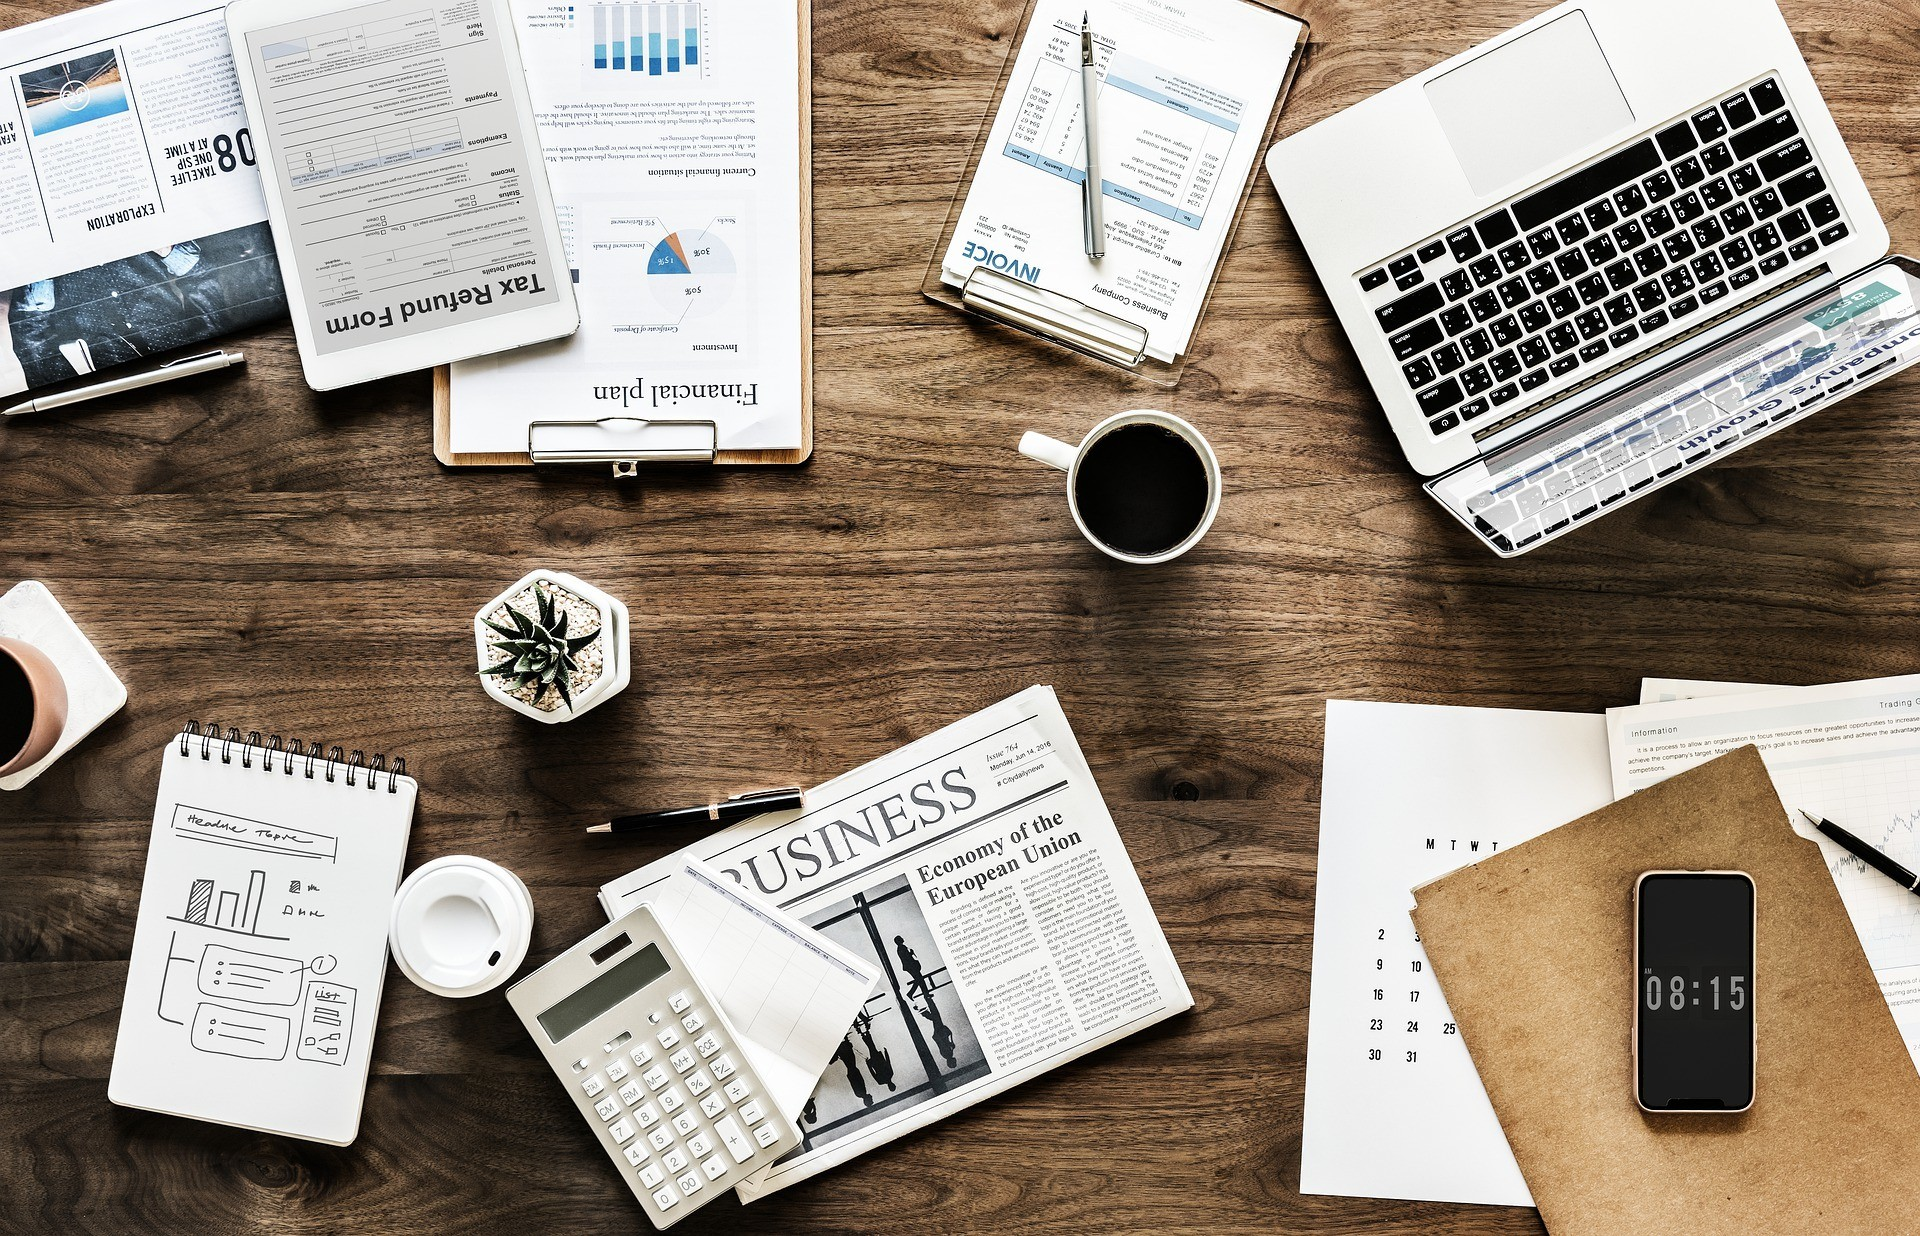 Preparing business travel